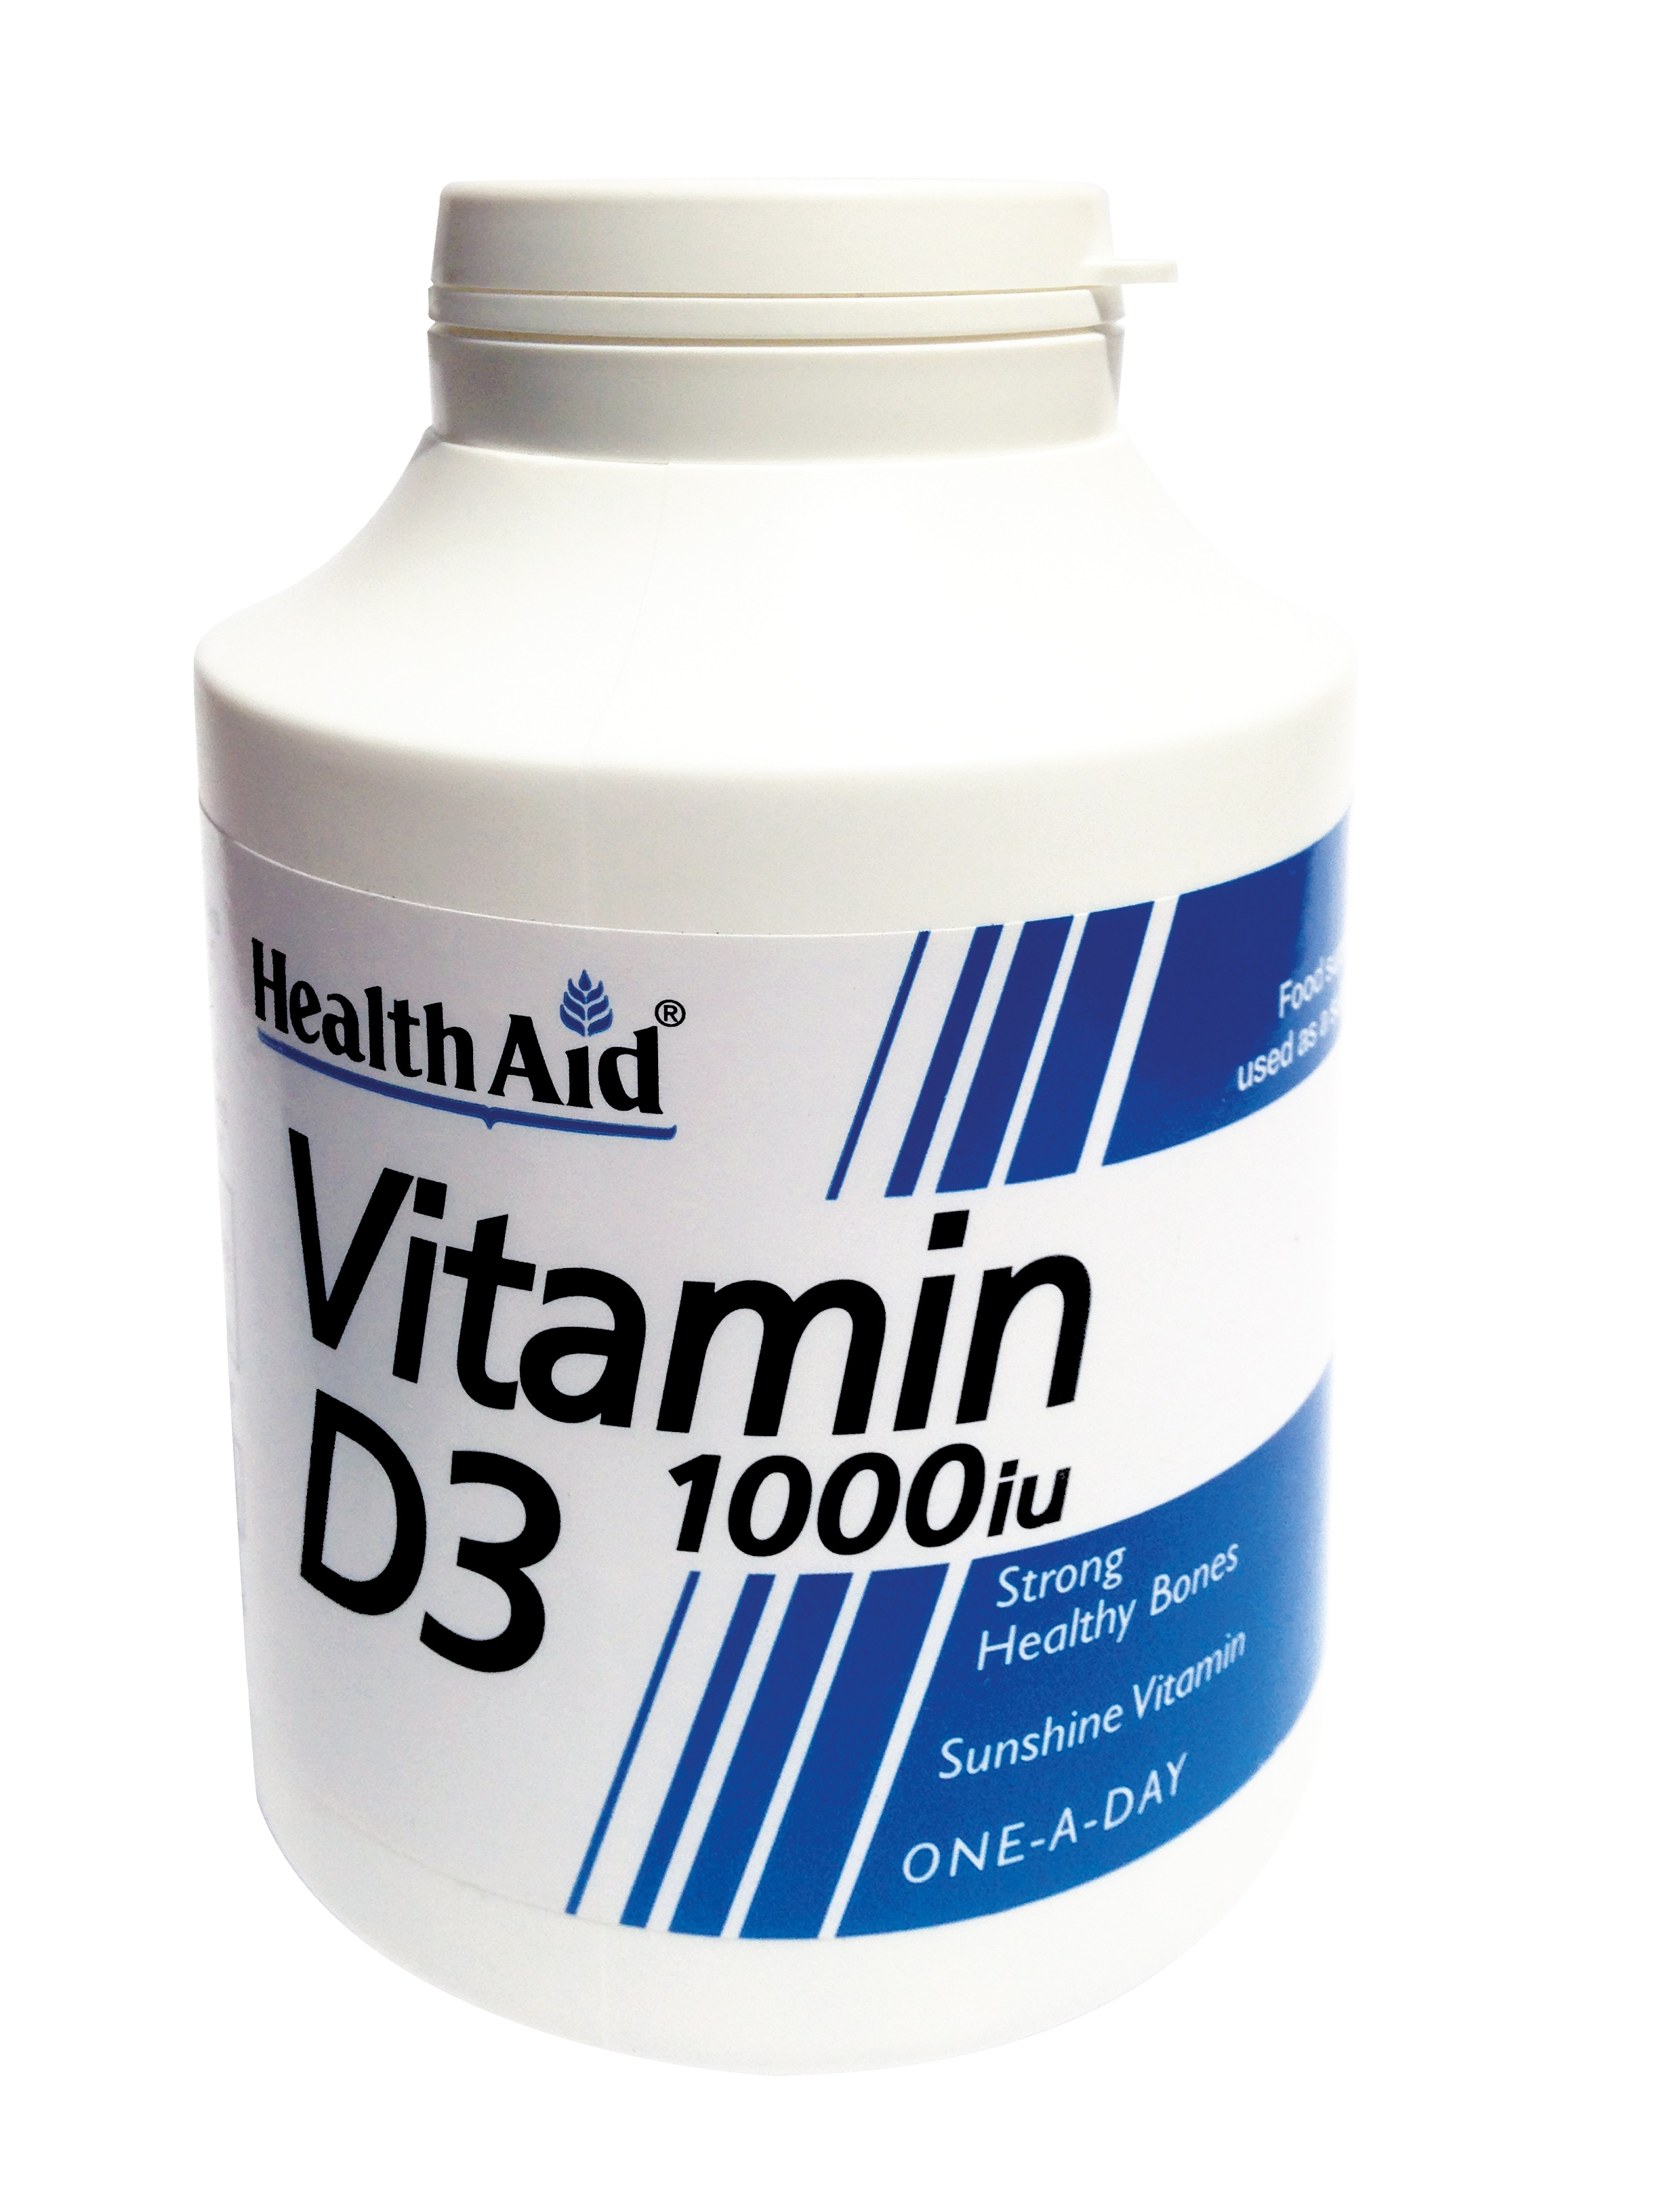 Vitamin D3 1000iu  1000's